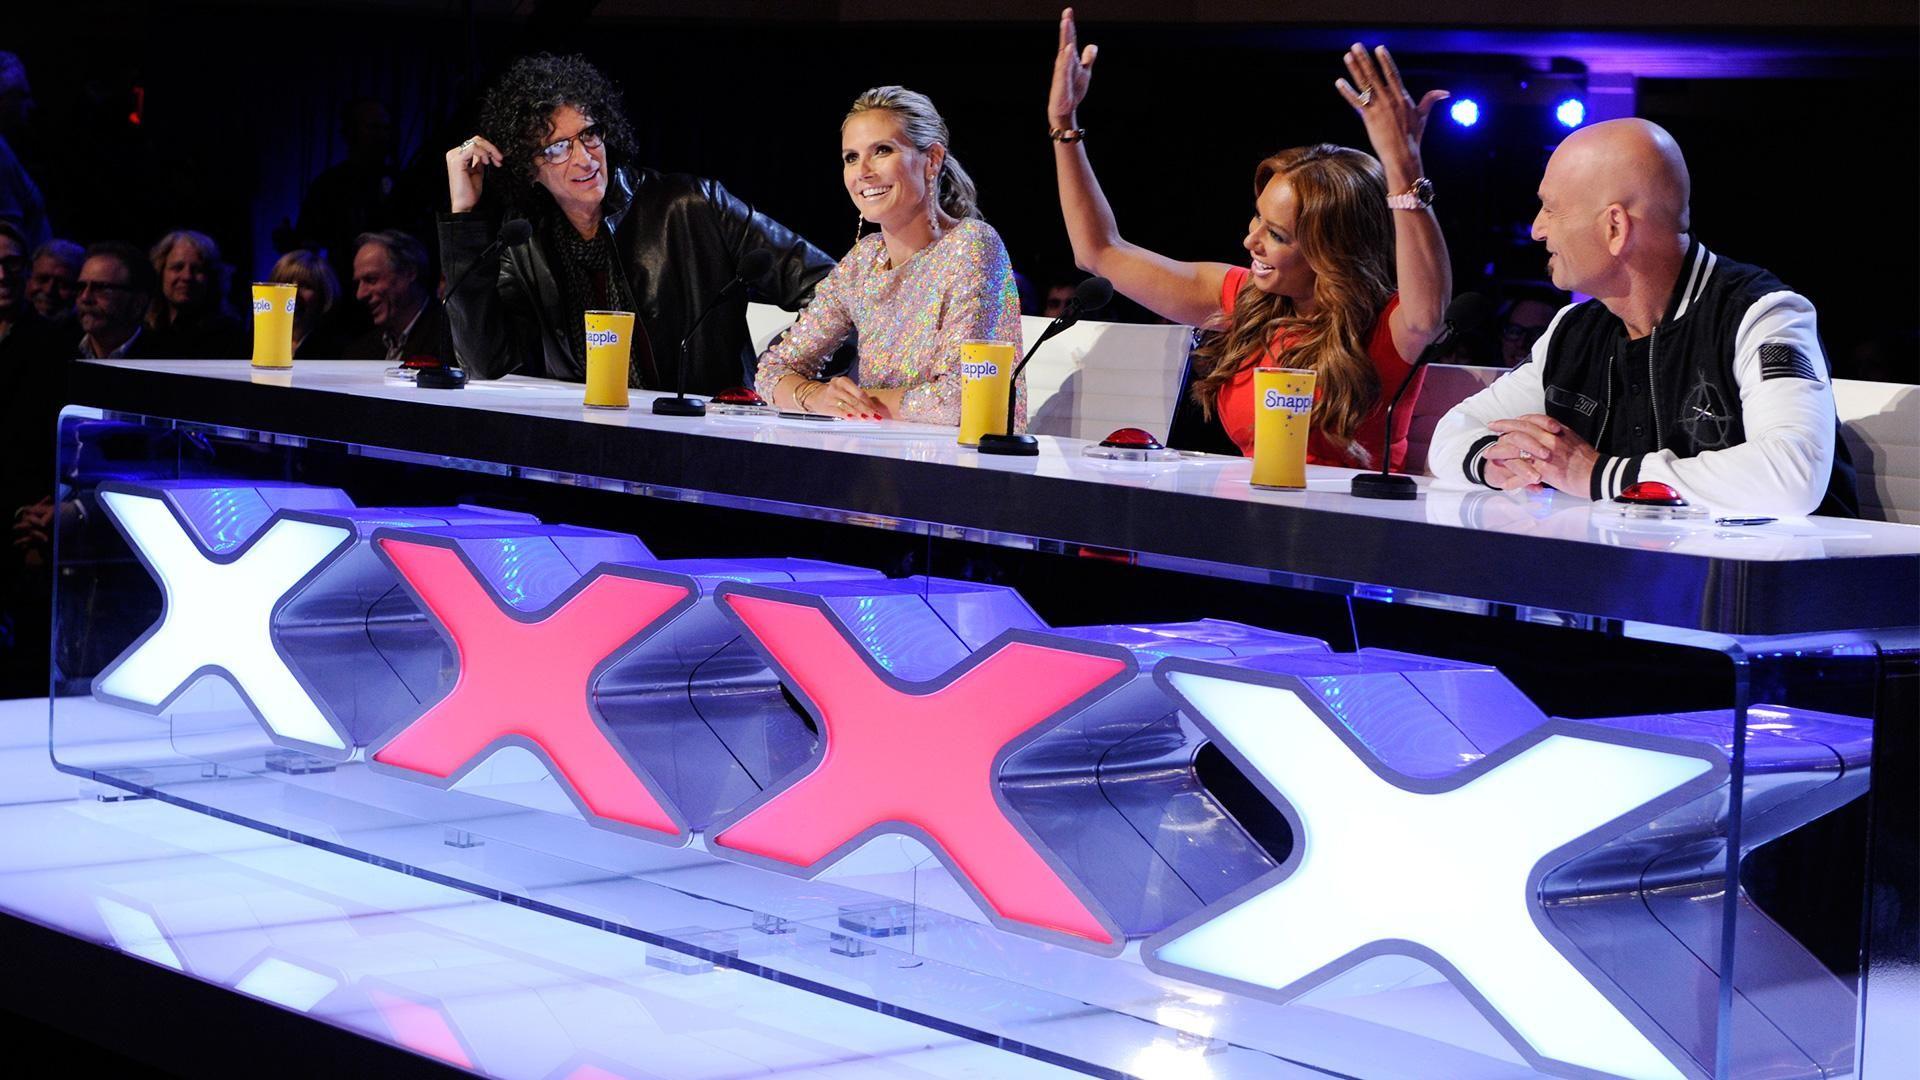 Americas Got Talent 2013: Mel B and Heidi Klum officially